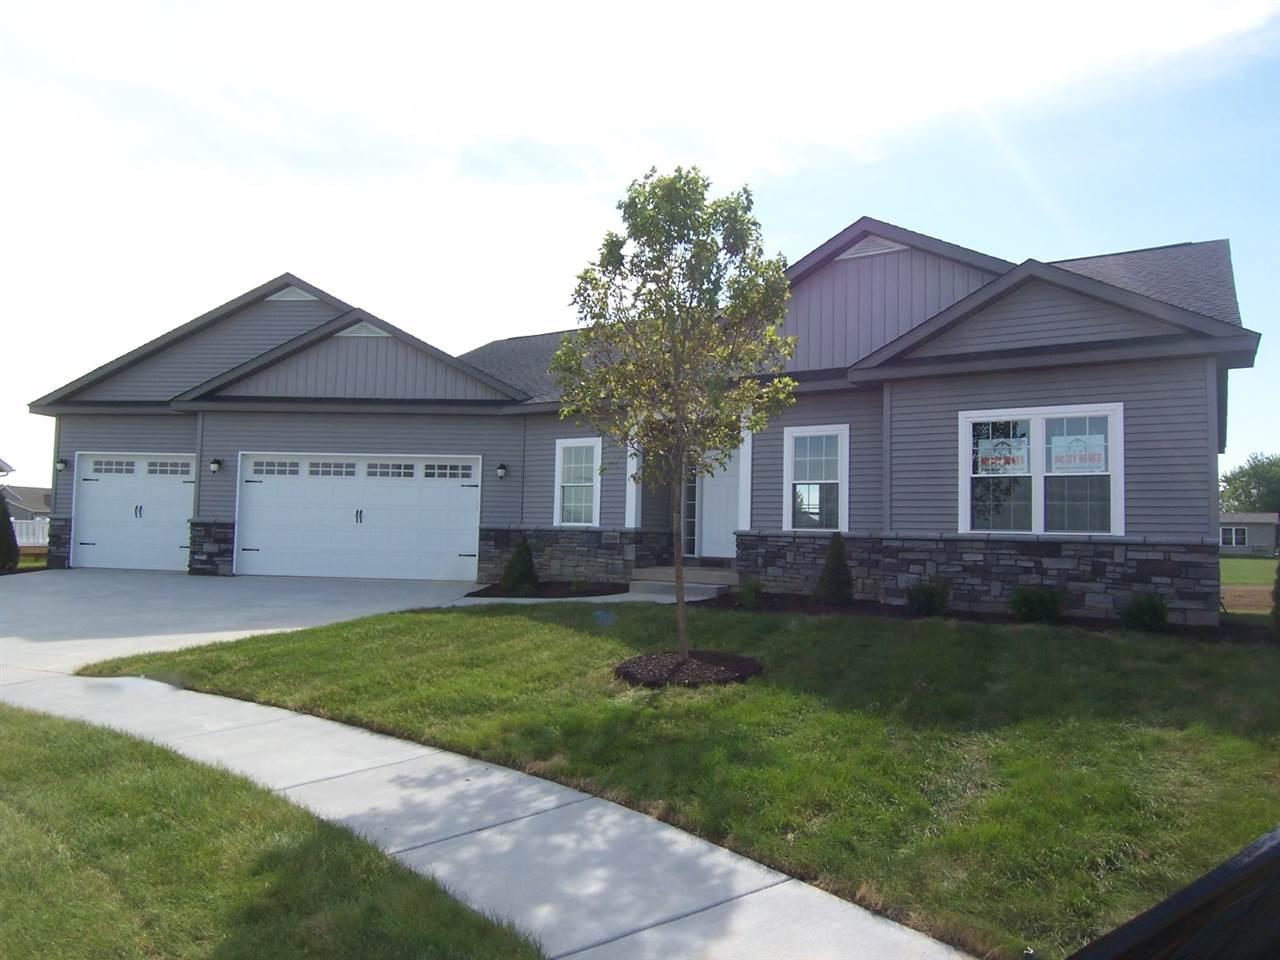 Real Estate for Sale, ListingId: 33608644, Davenport,IA52807